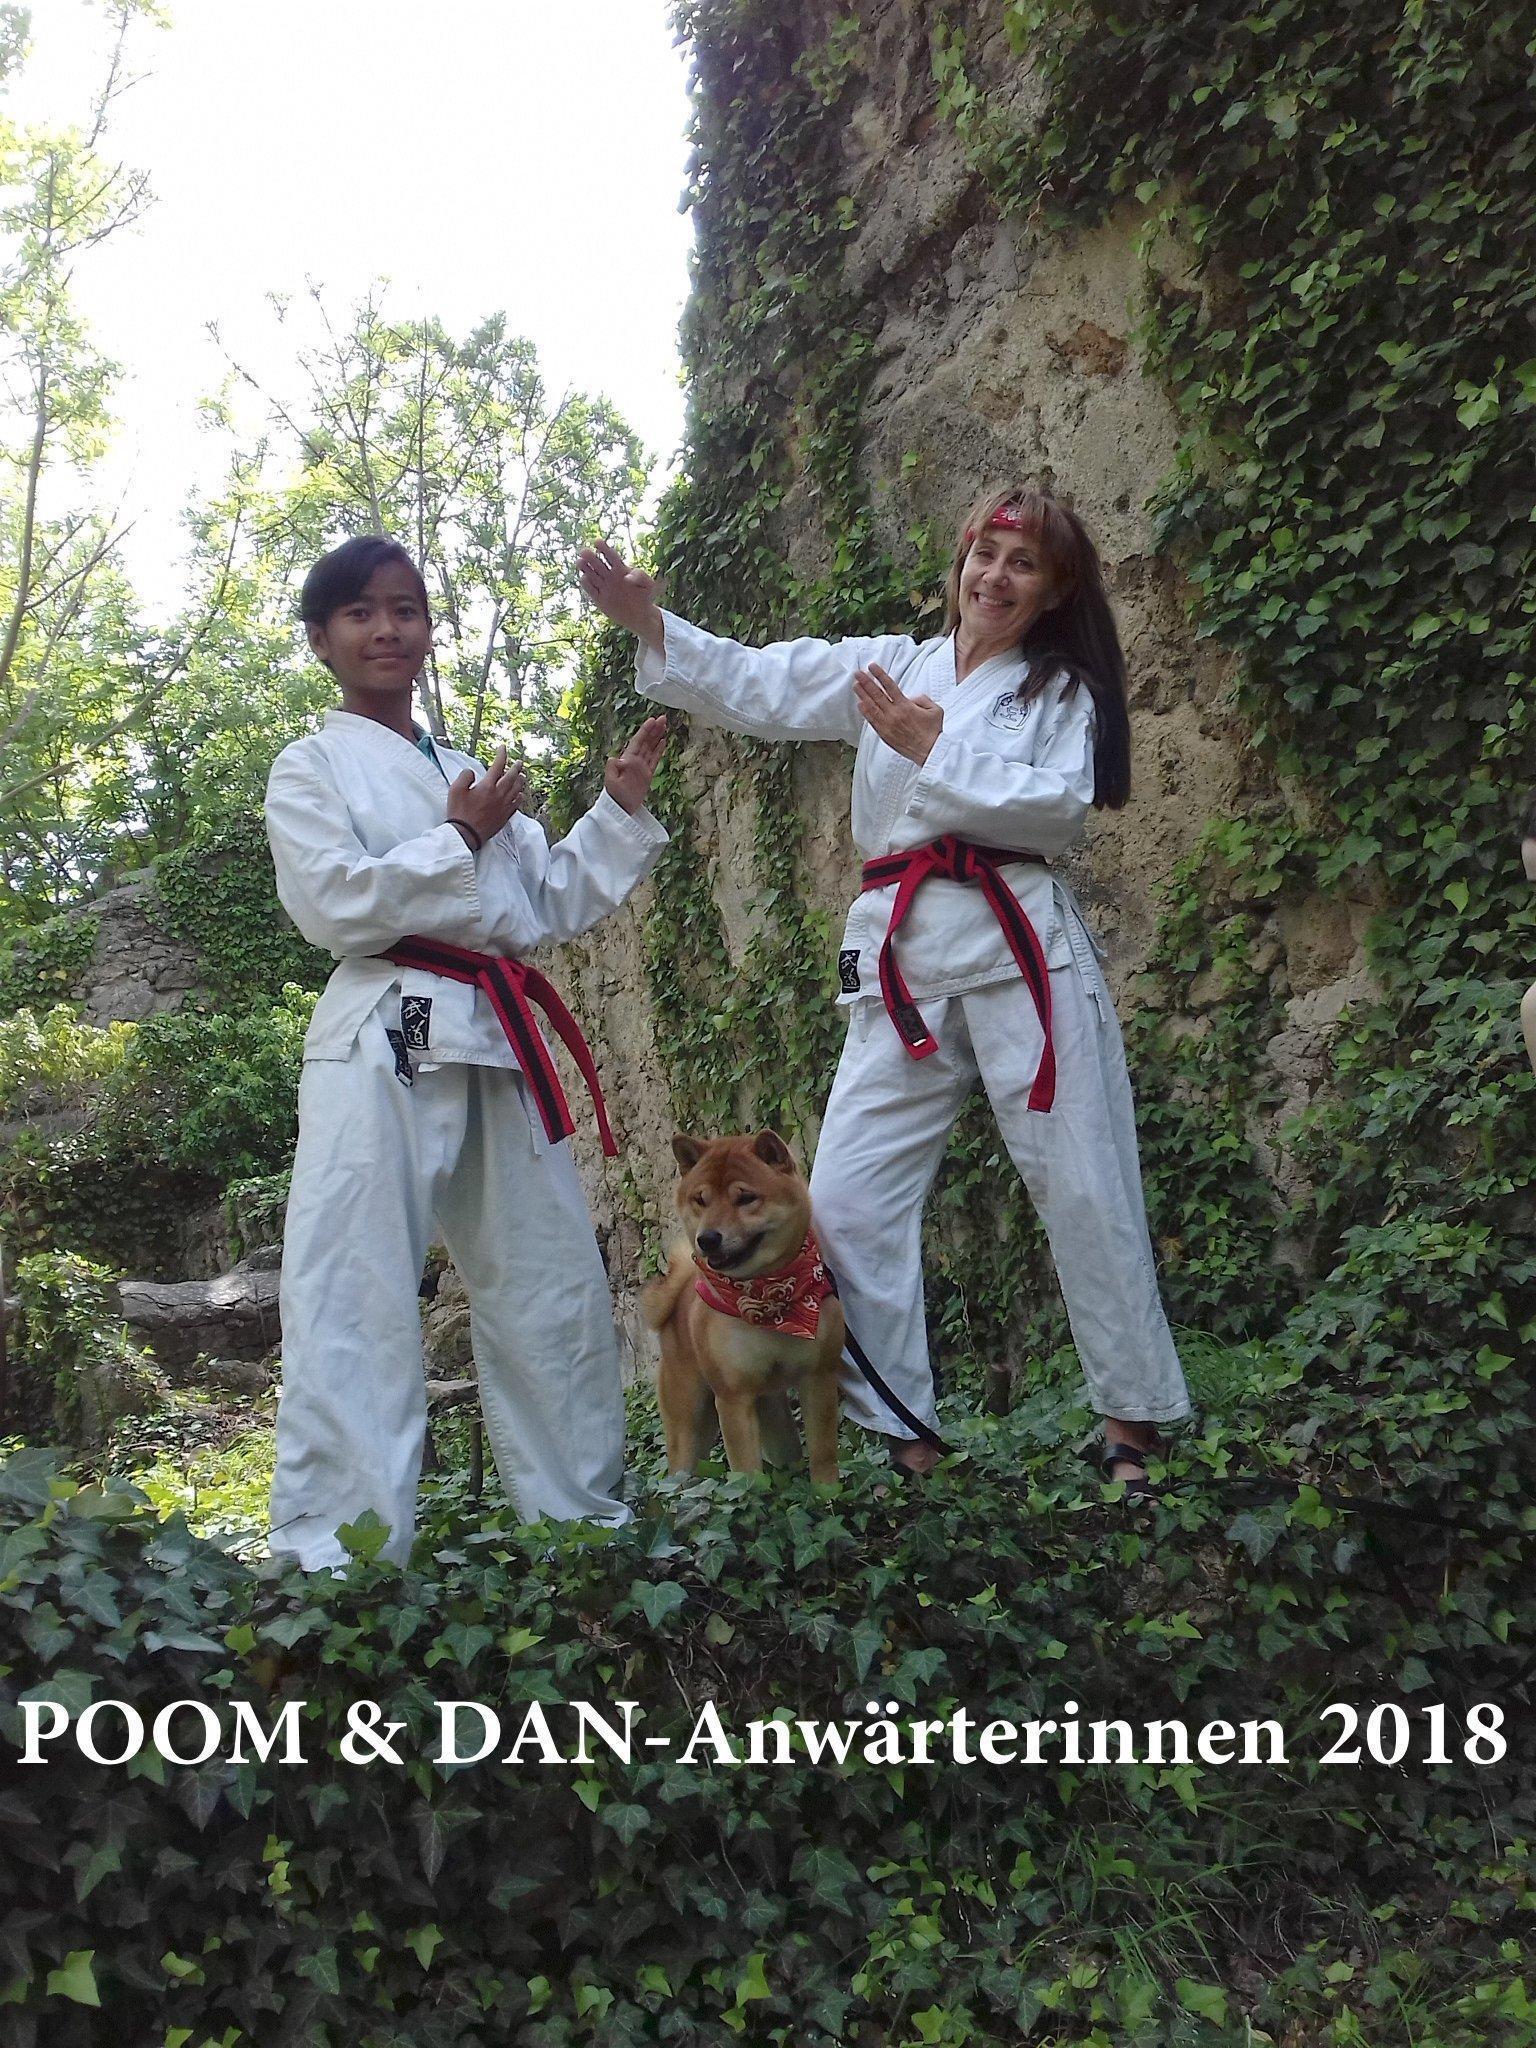 YOUNG-UNG Taekwondo Bulgarien Camp Kampfkunst